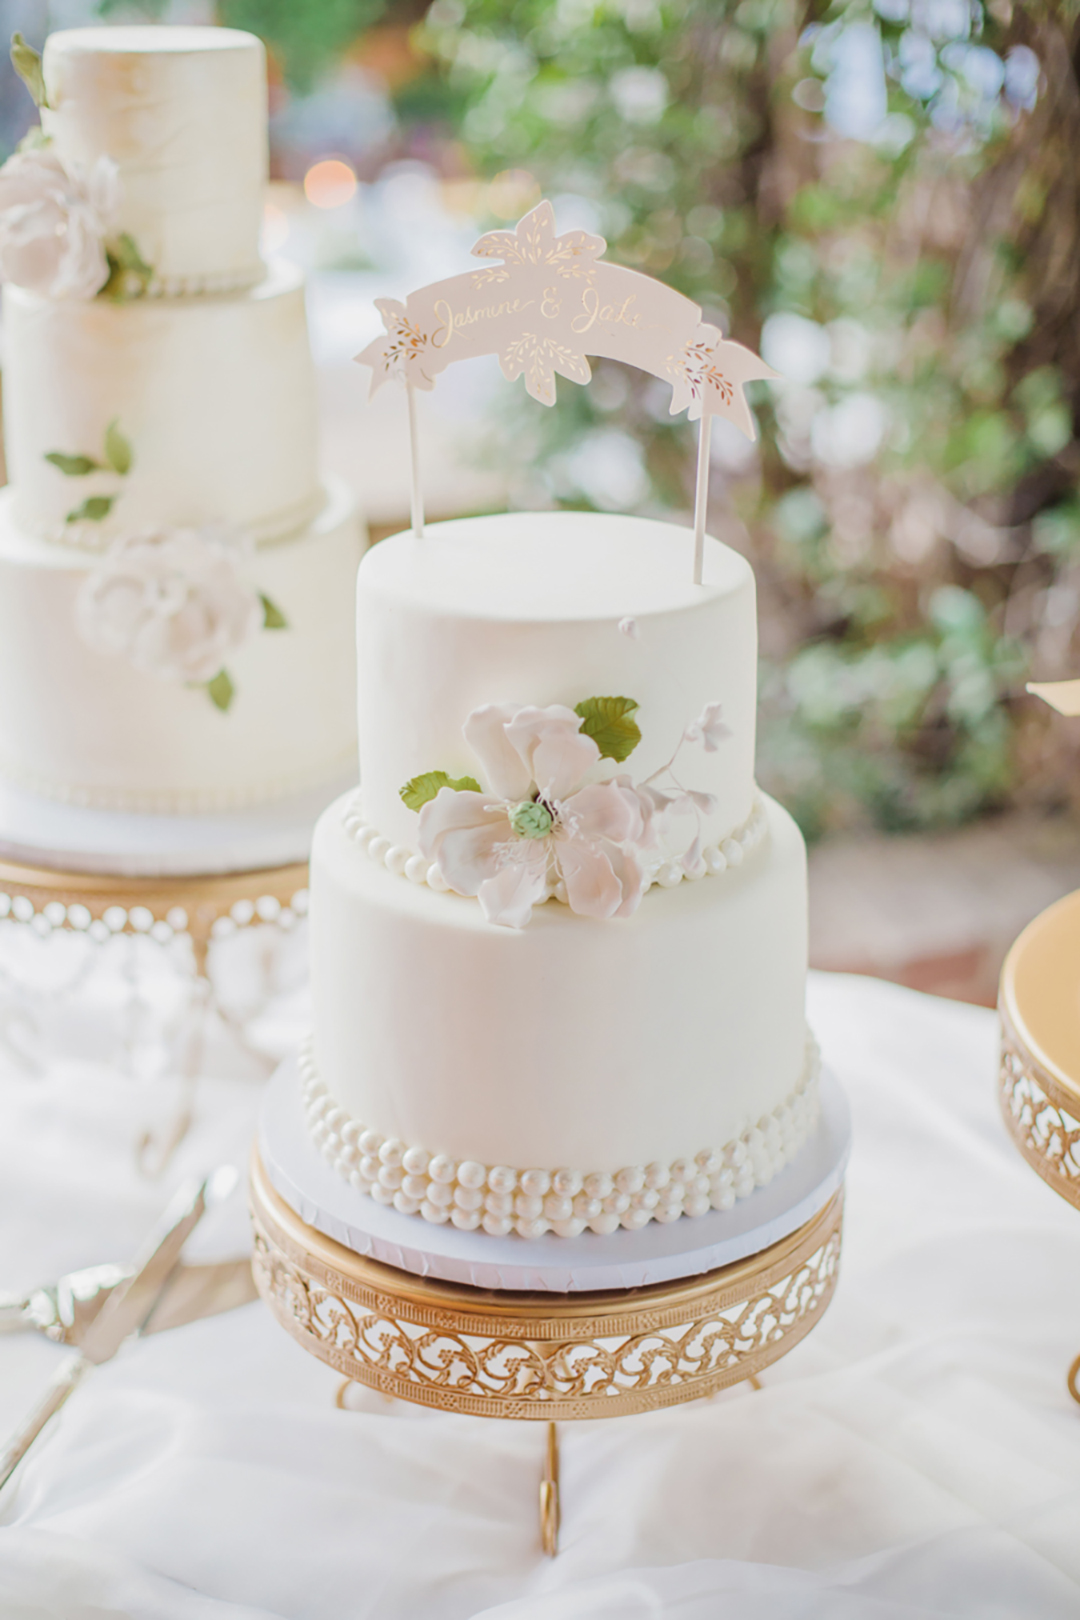 opulenttreasures-gold-cake-stand-HiRES-elysehallphoto.jpg